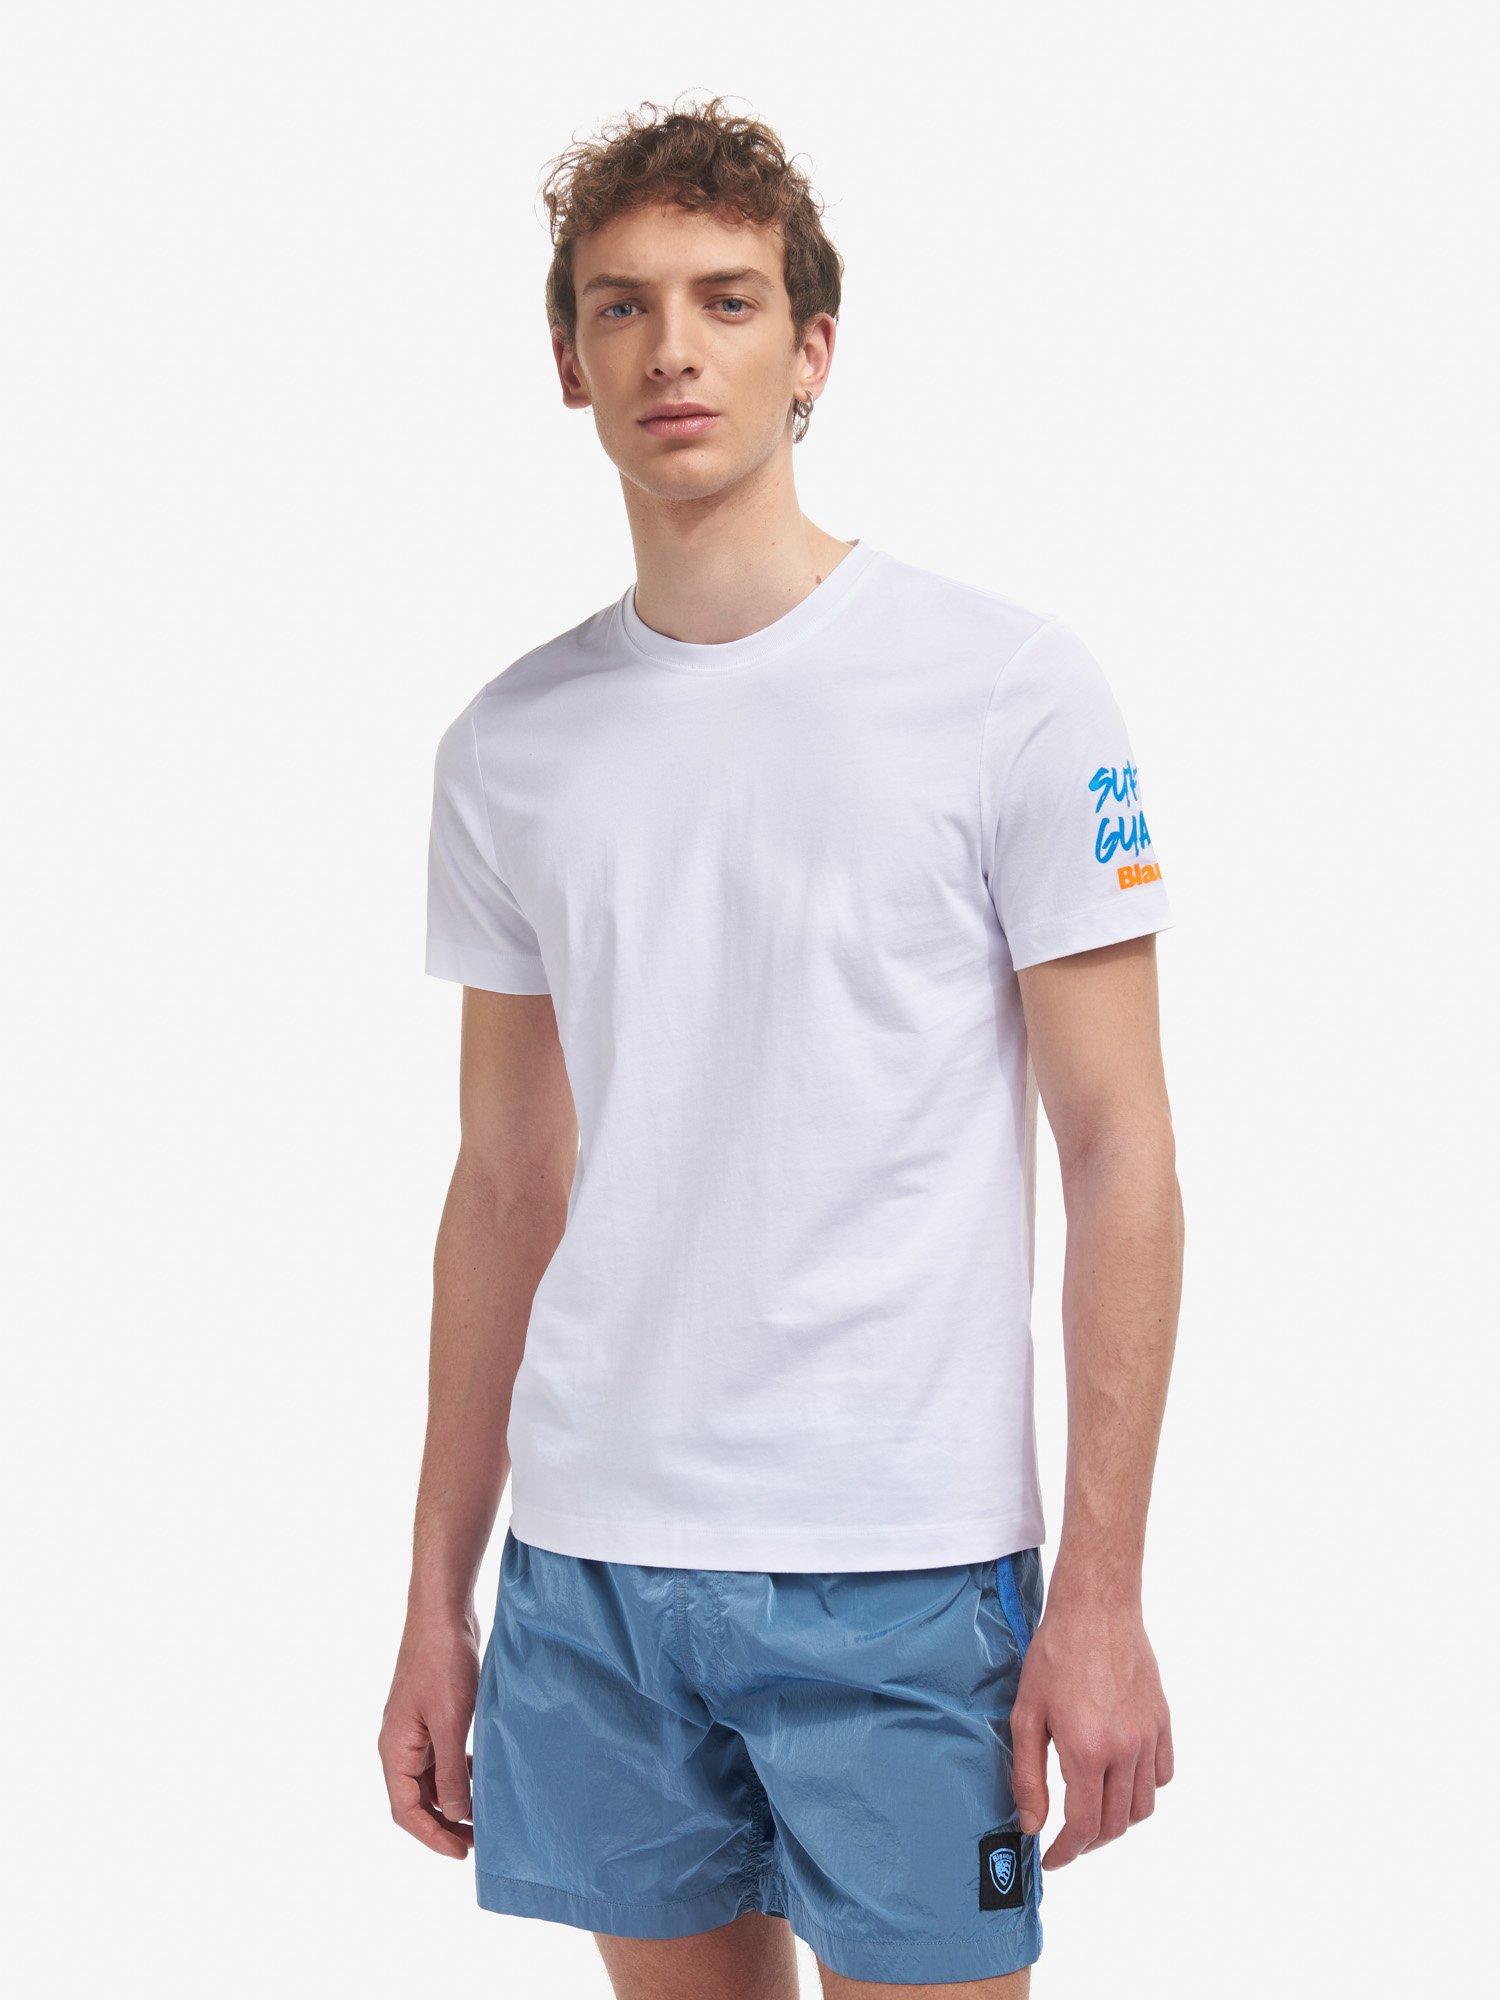 Blauer - T-SHIRT MIAMI BEACH - Weiss - Blauer